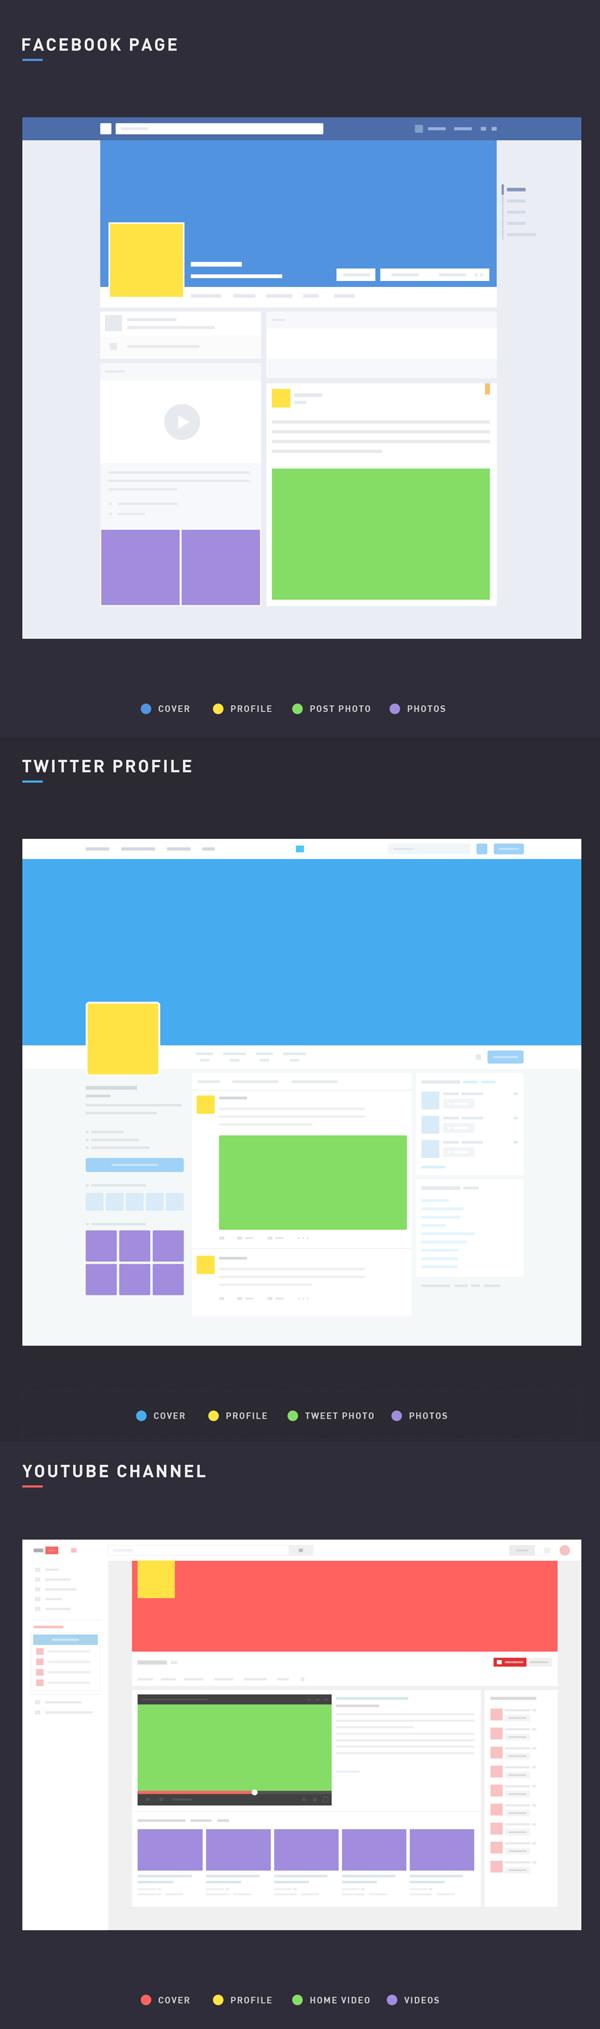 Free Social Media Mockup PSD Layouts